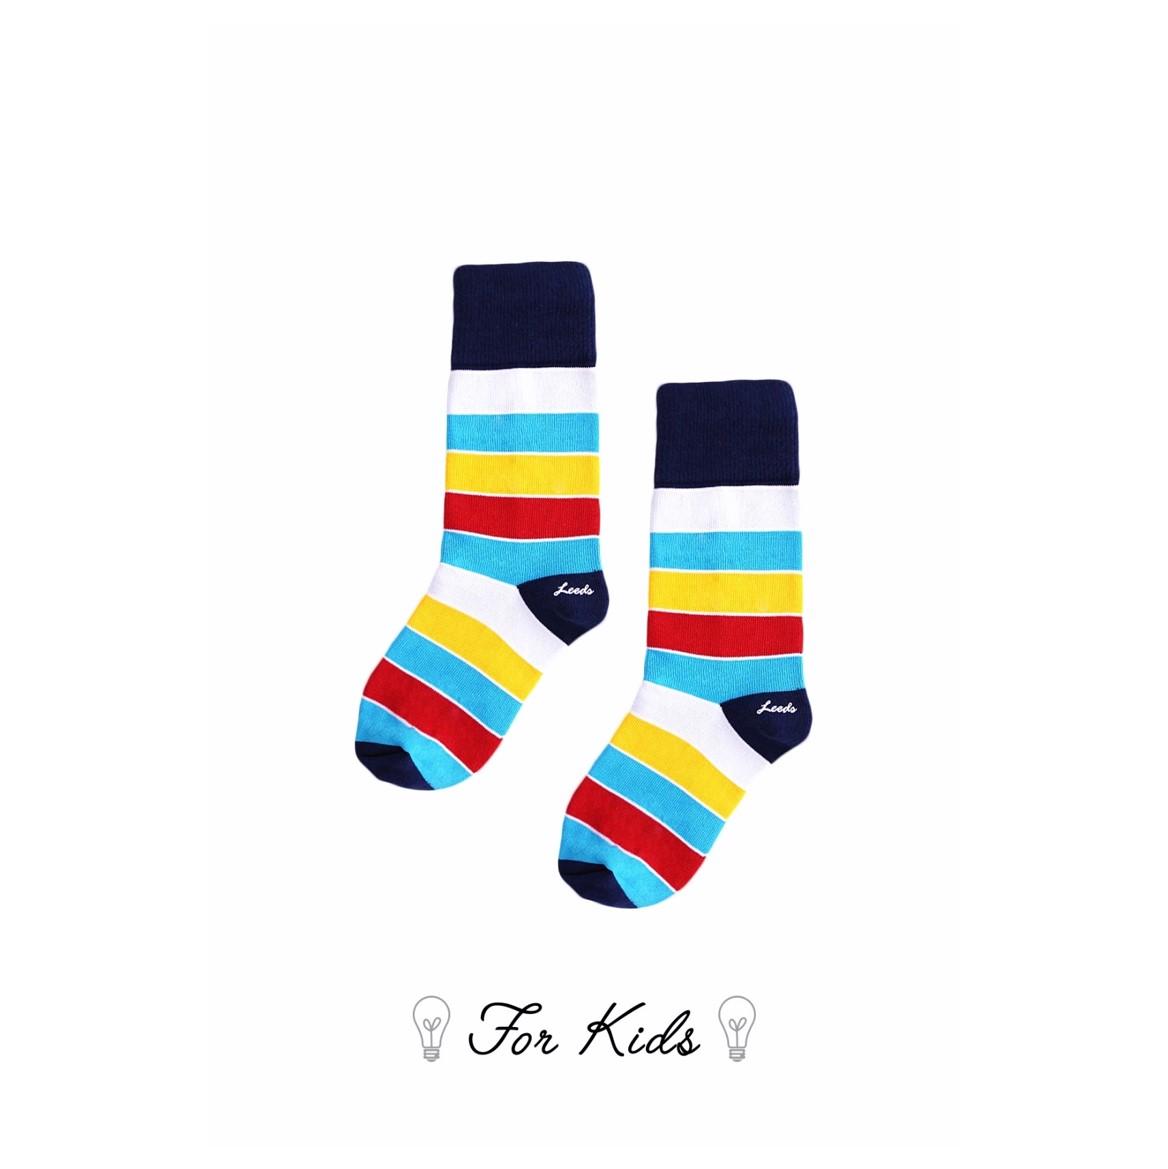 Leeds weather【英國設計】天然純棉孩童襪★超氣質條紋襪子【Cotton Socks Recommendations】- York ( Chalk & Cheese 系列共4款) 皇室御用推薦、可愛穿搭、透氣舒適